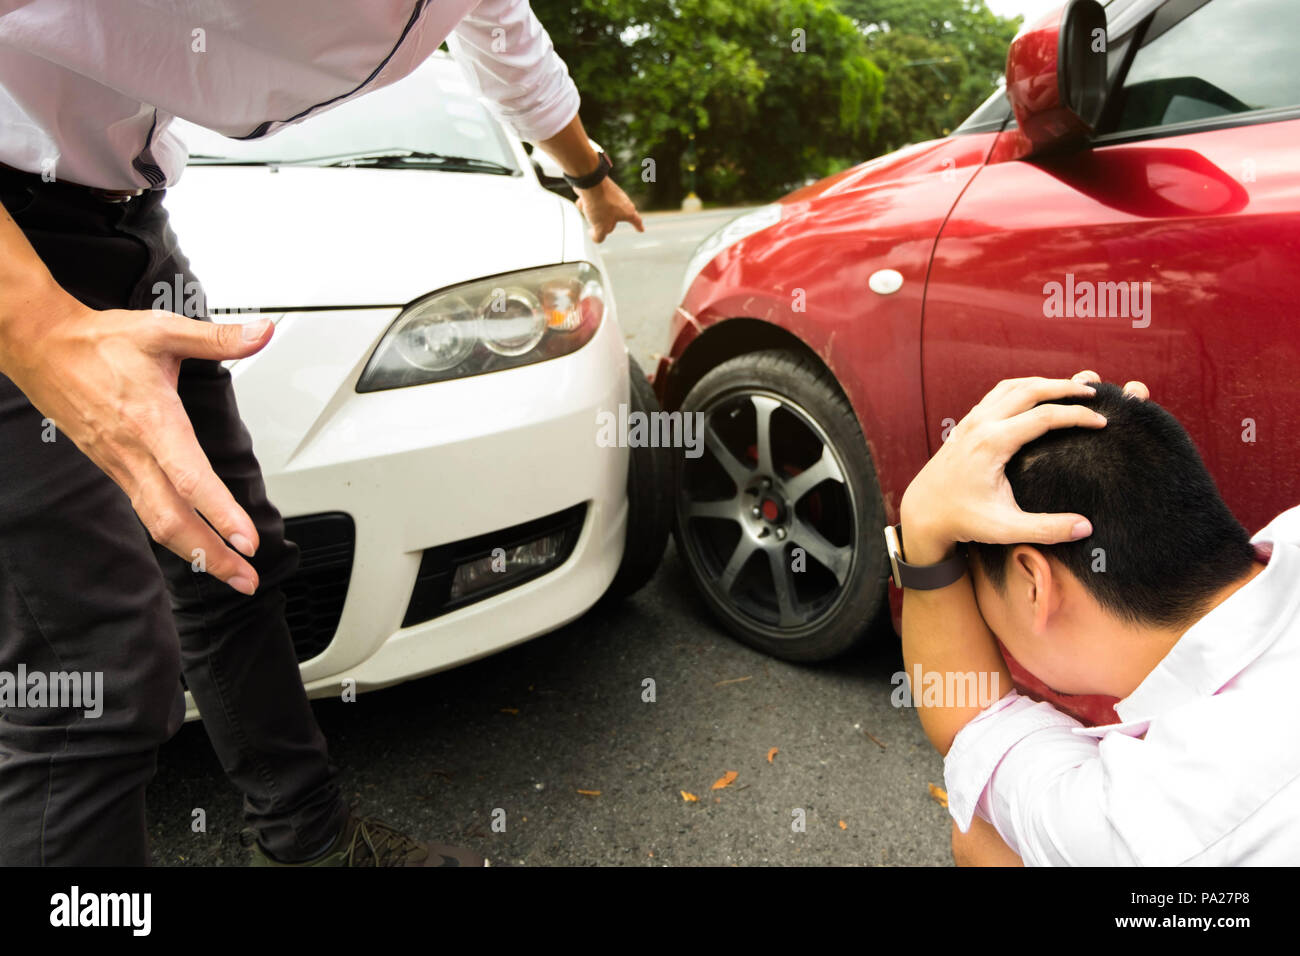 Car crash on the road ,wait insurance claim . Insurance claim concept . - Stock Image